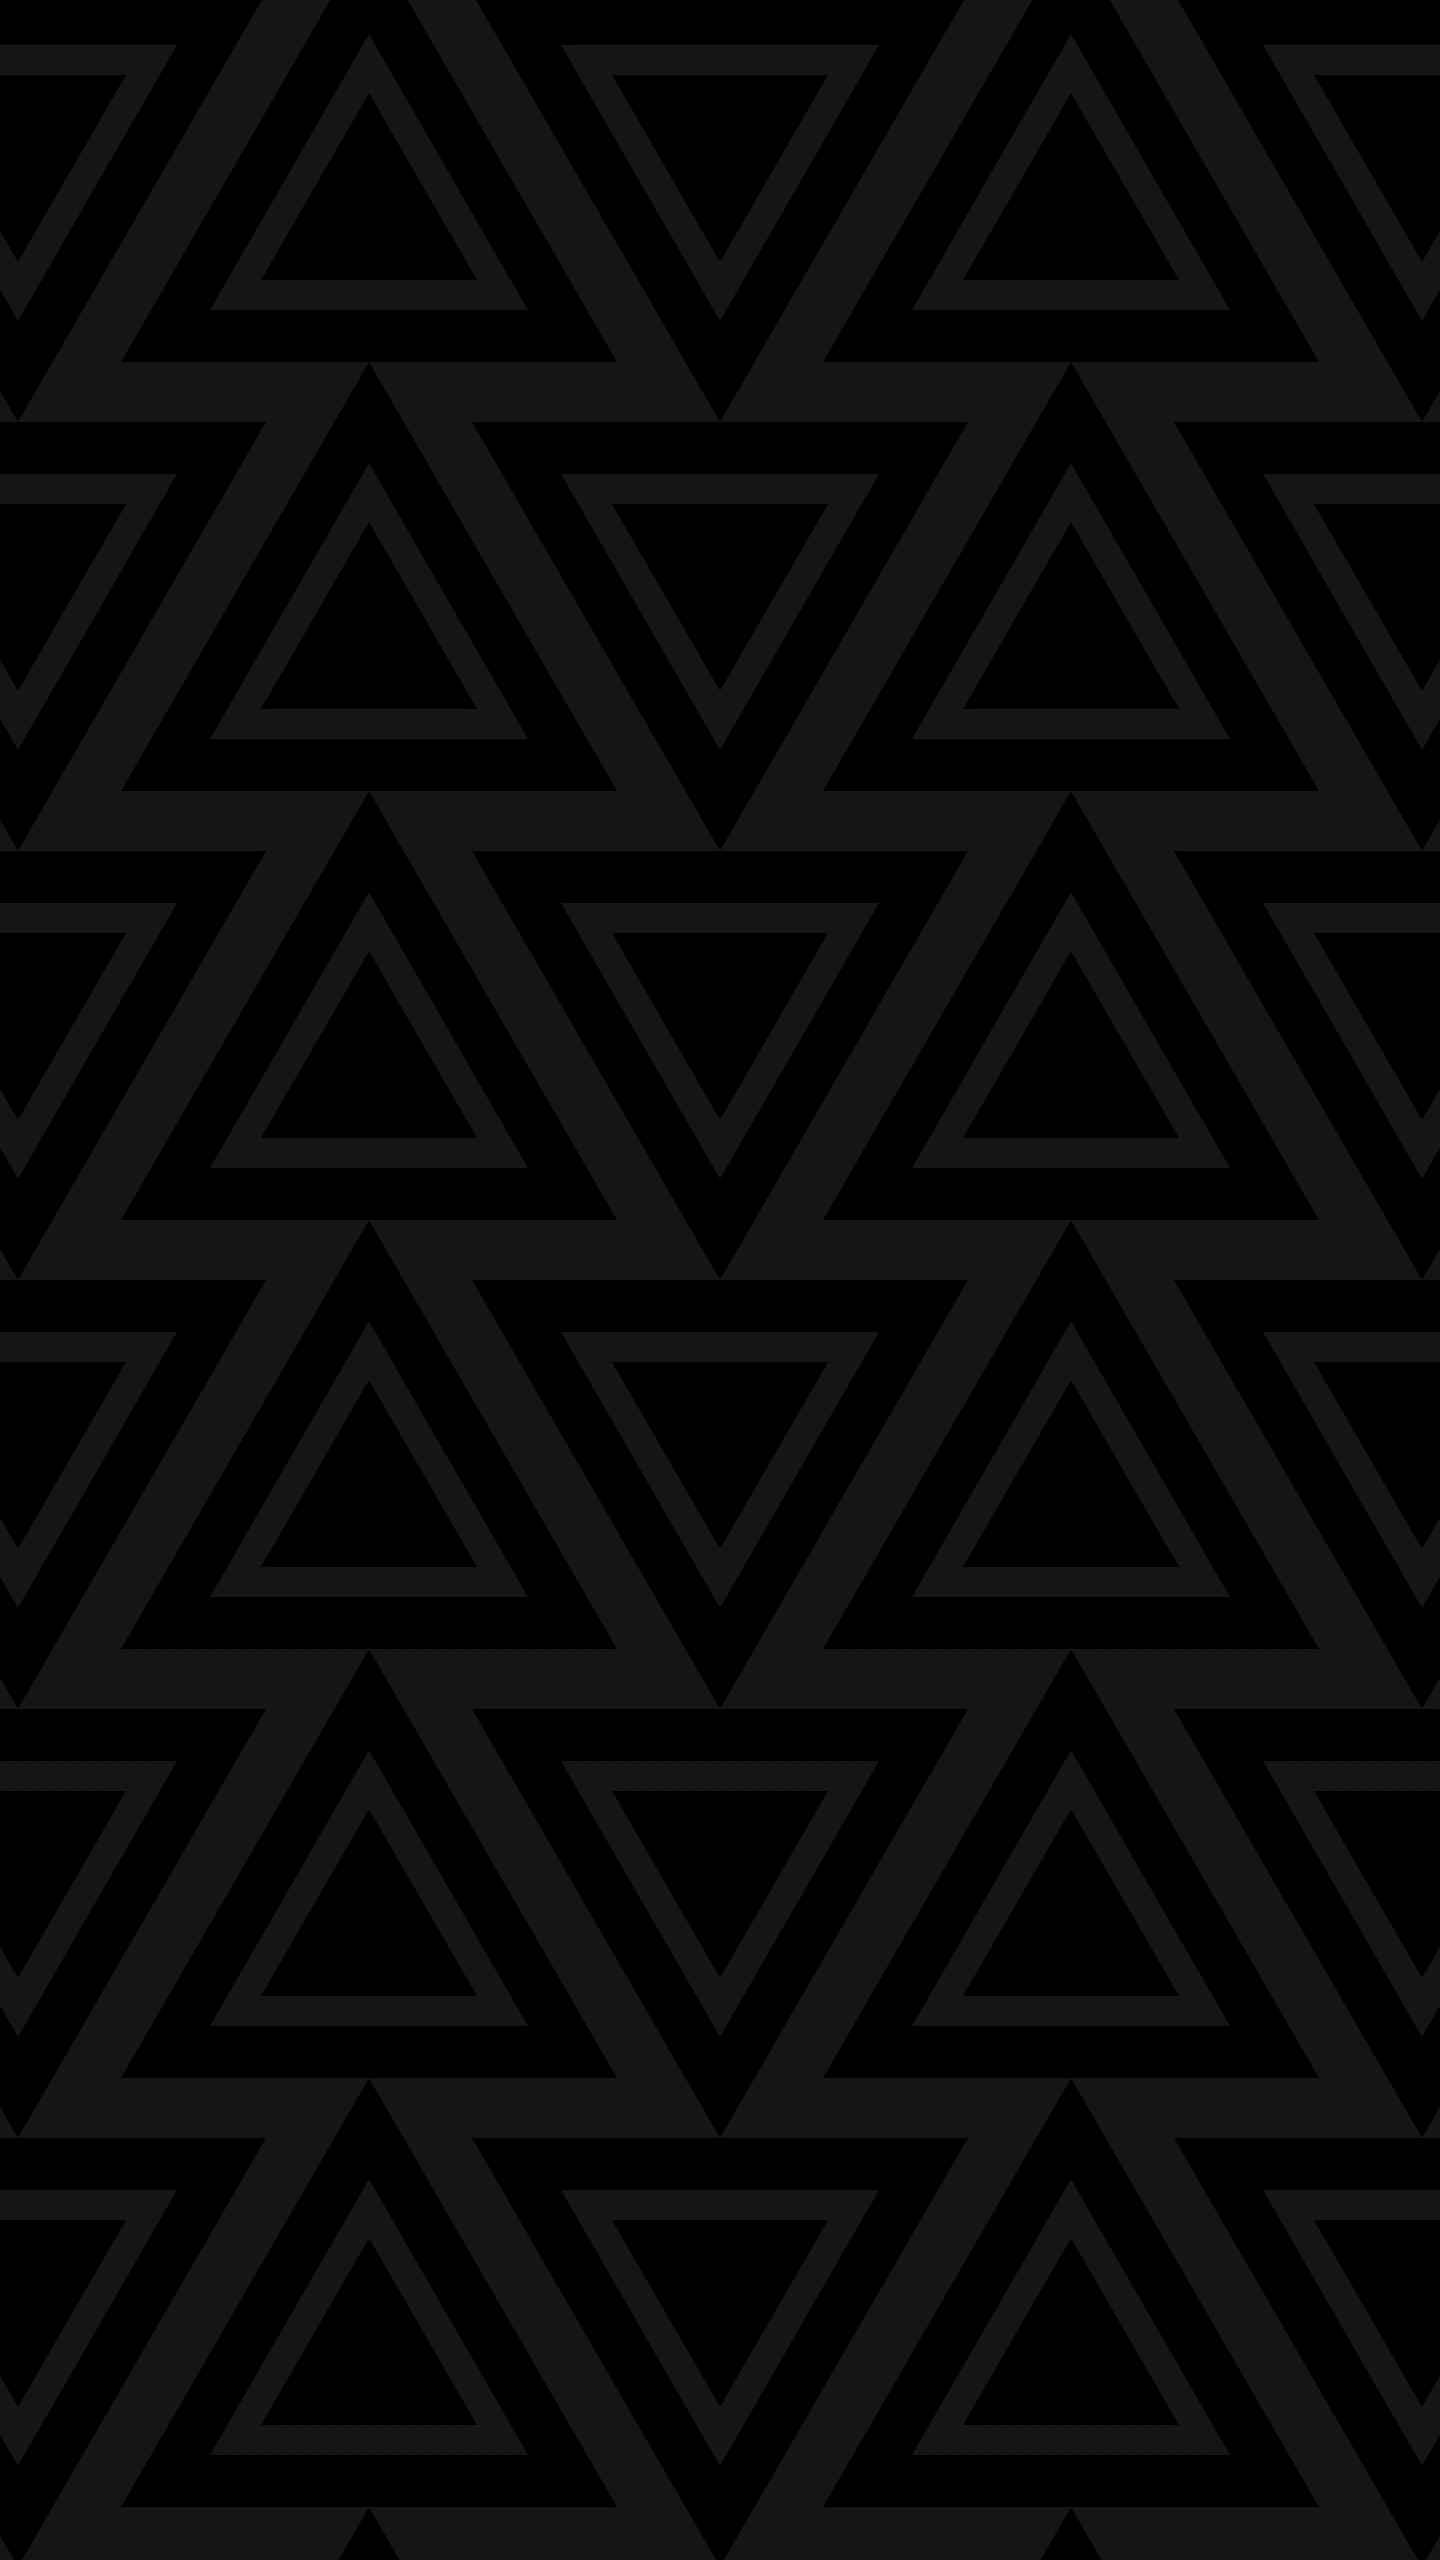 Dark Pattern iPhone Wallpaper 1